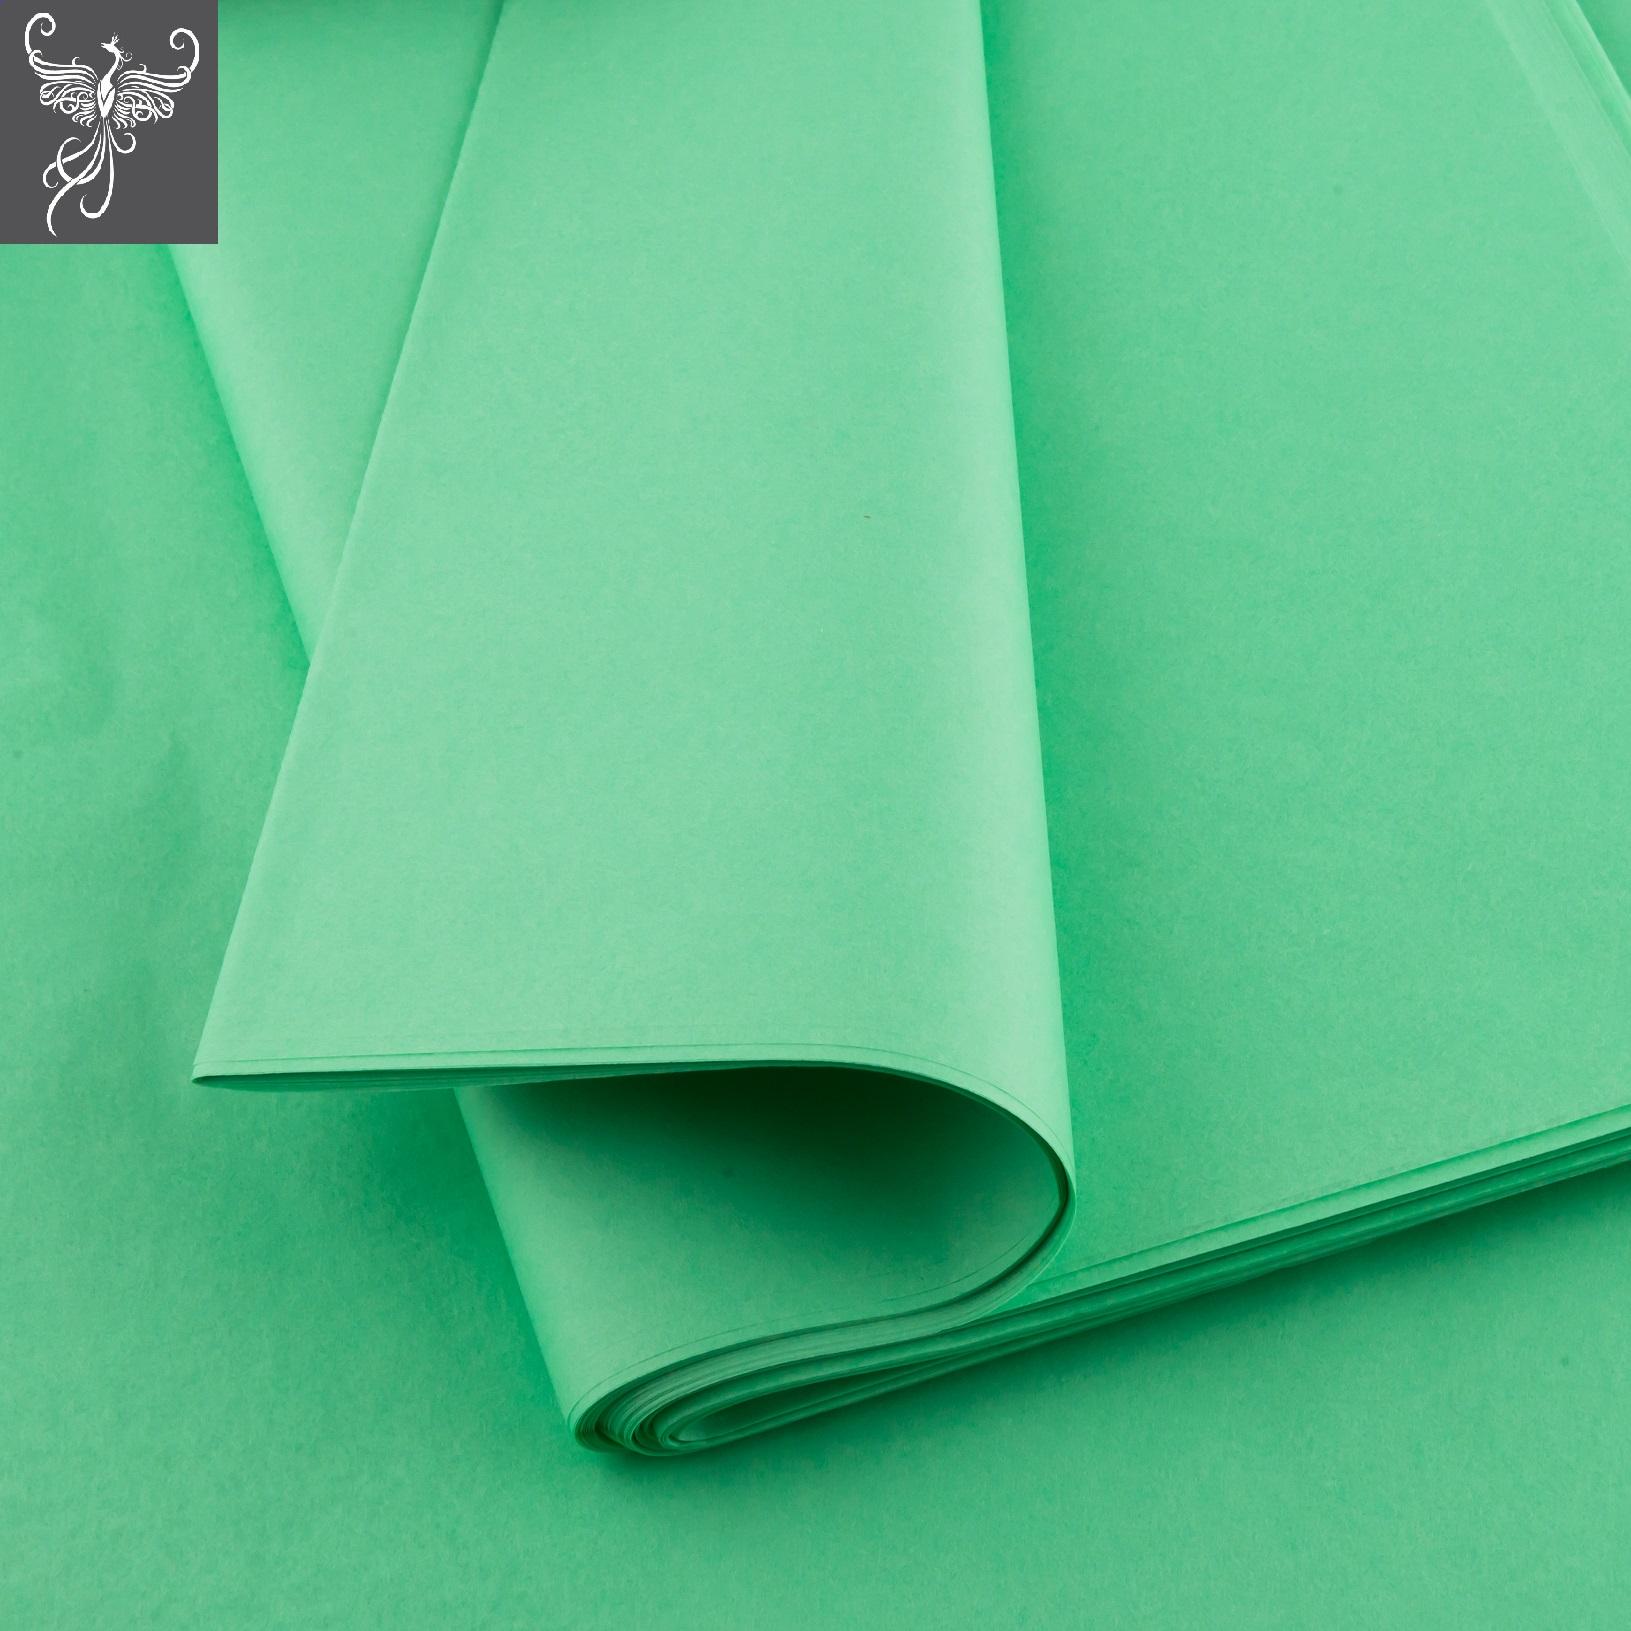 Plain tissue paper mint green